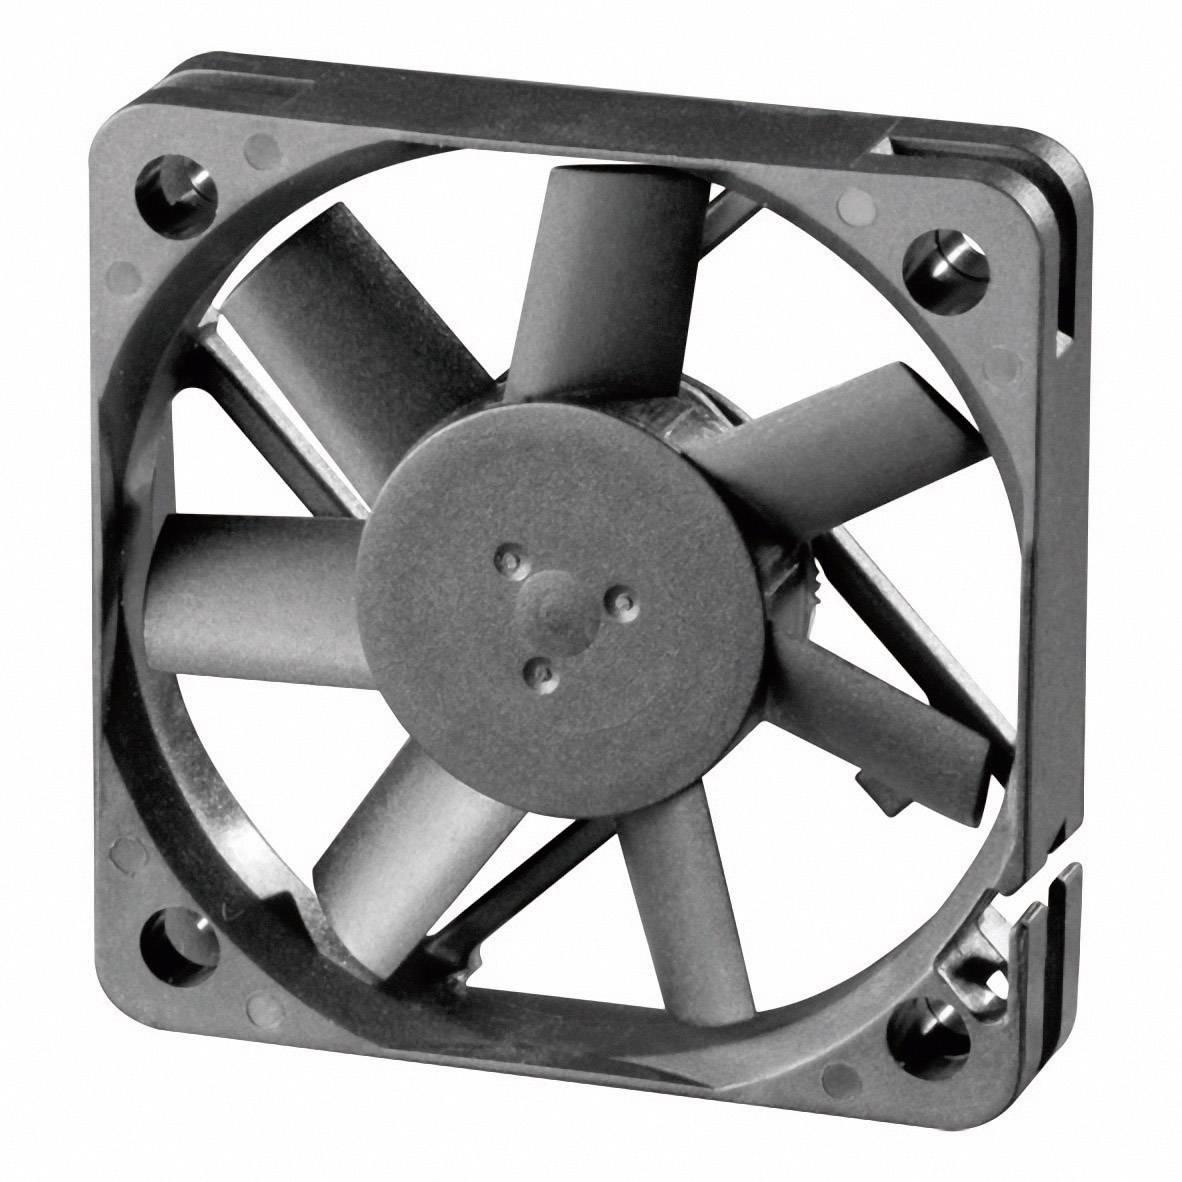 Ventilátor Sunon DR MB50100V2-0000-A99, 50 x 50 x 10 mm, 5 V/DC